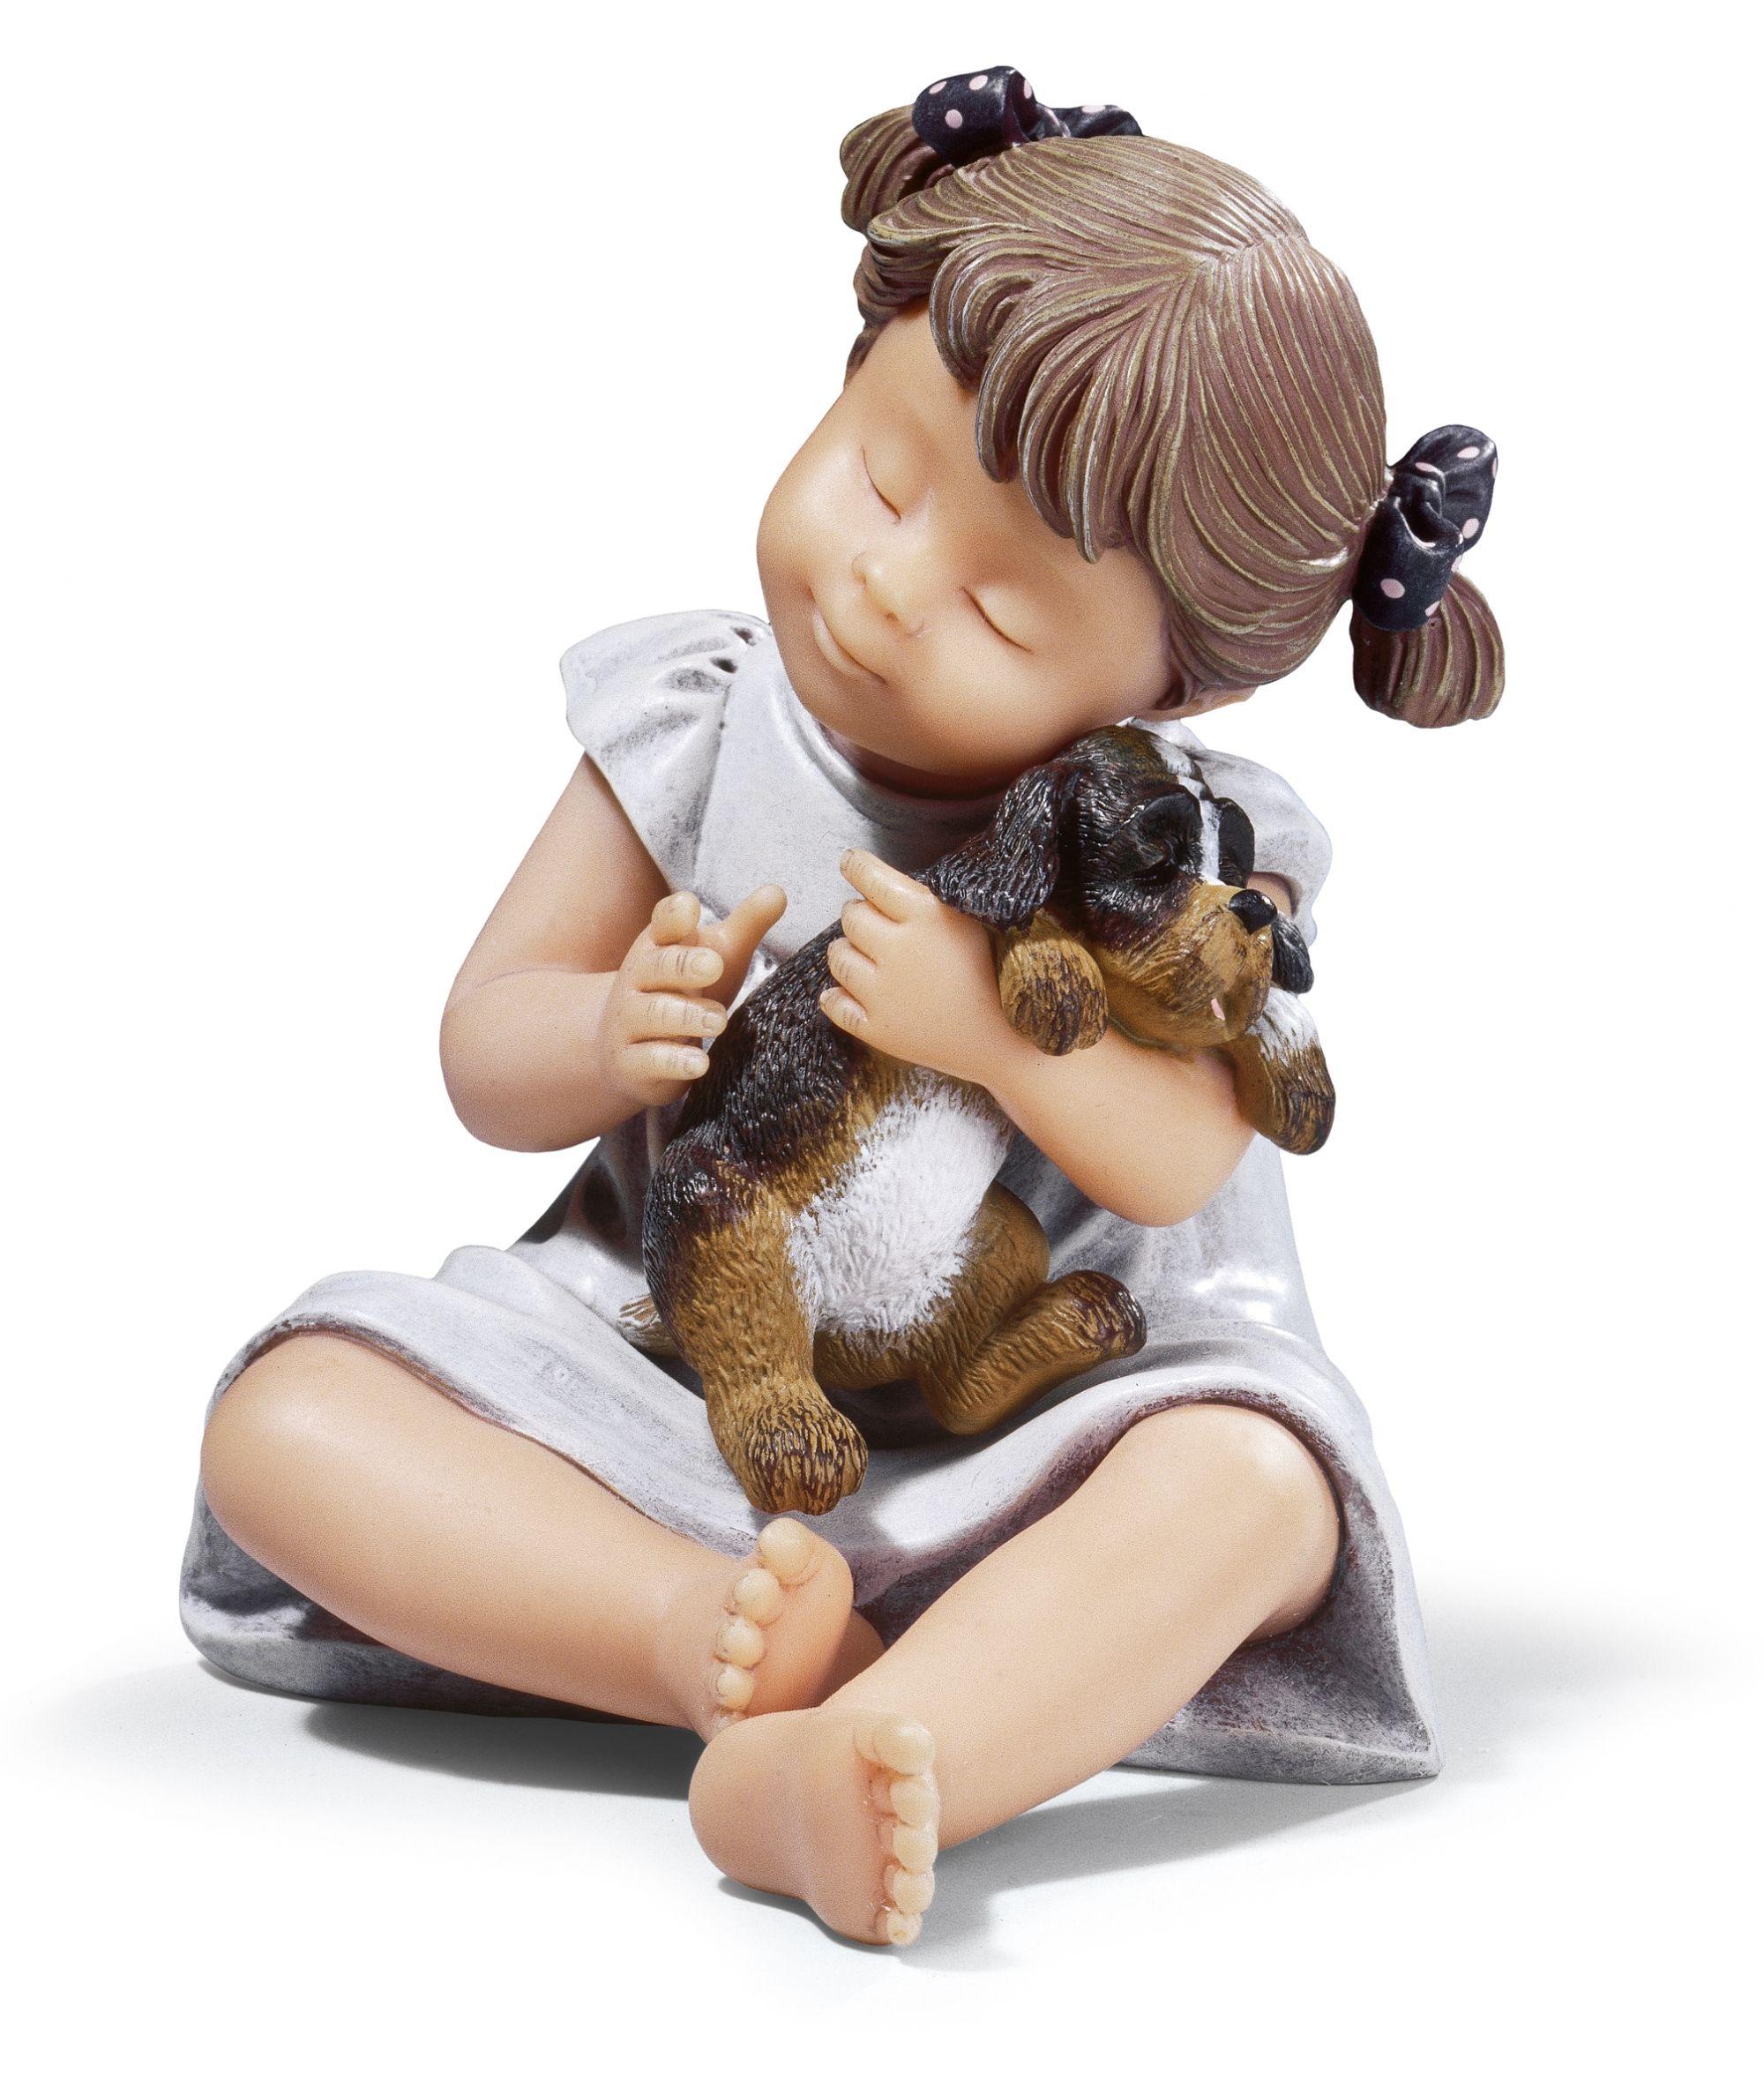 Duérmete Doggi Perrito Figuritas Perros